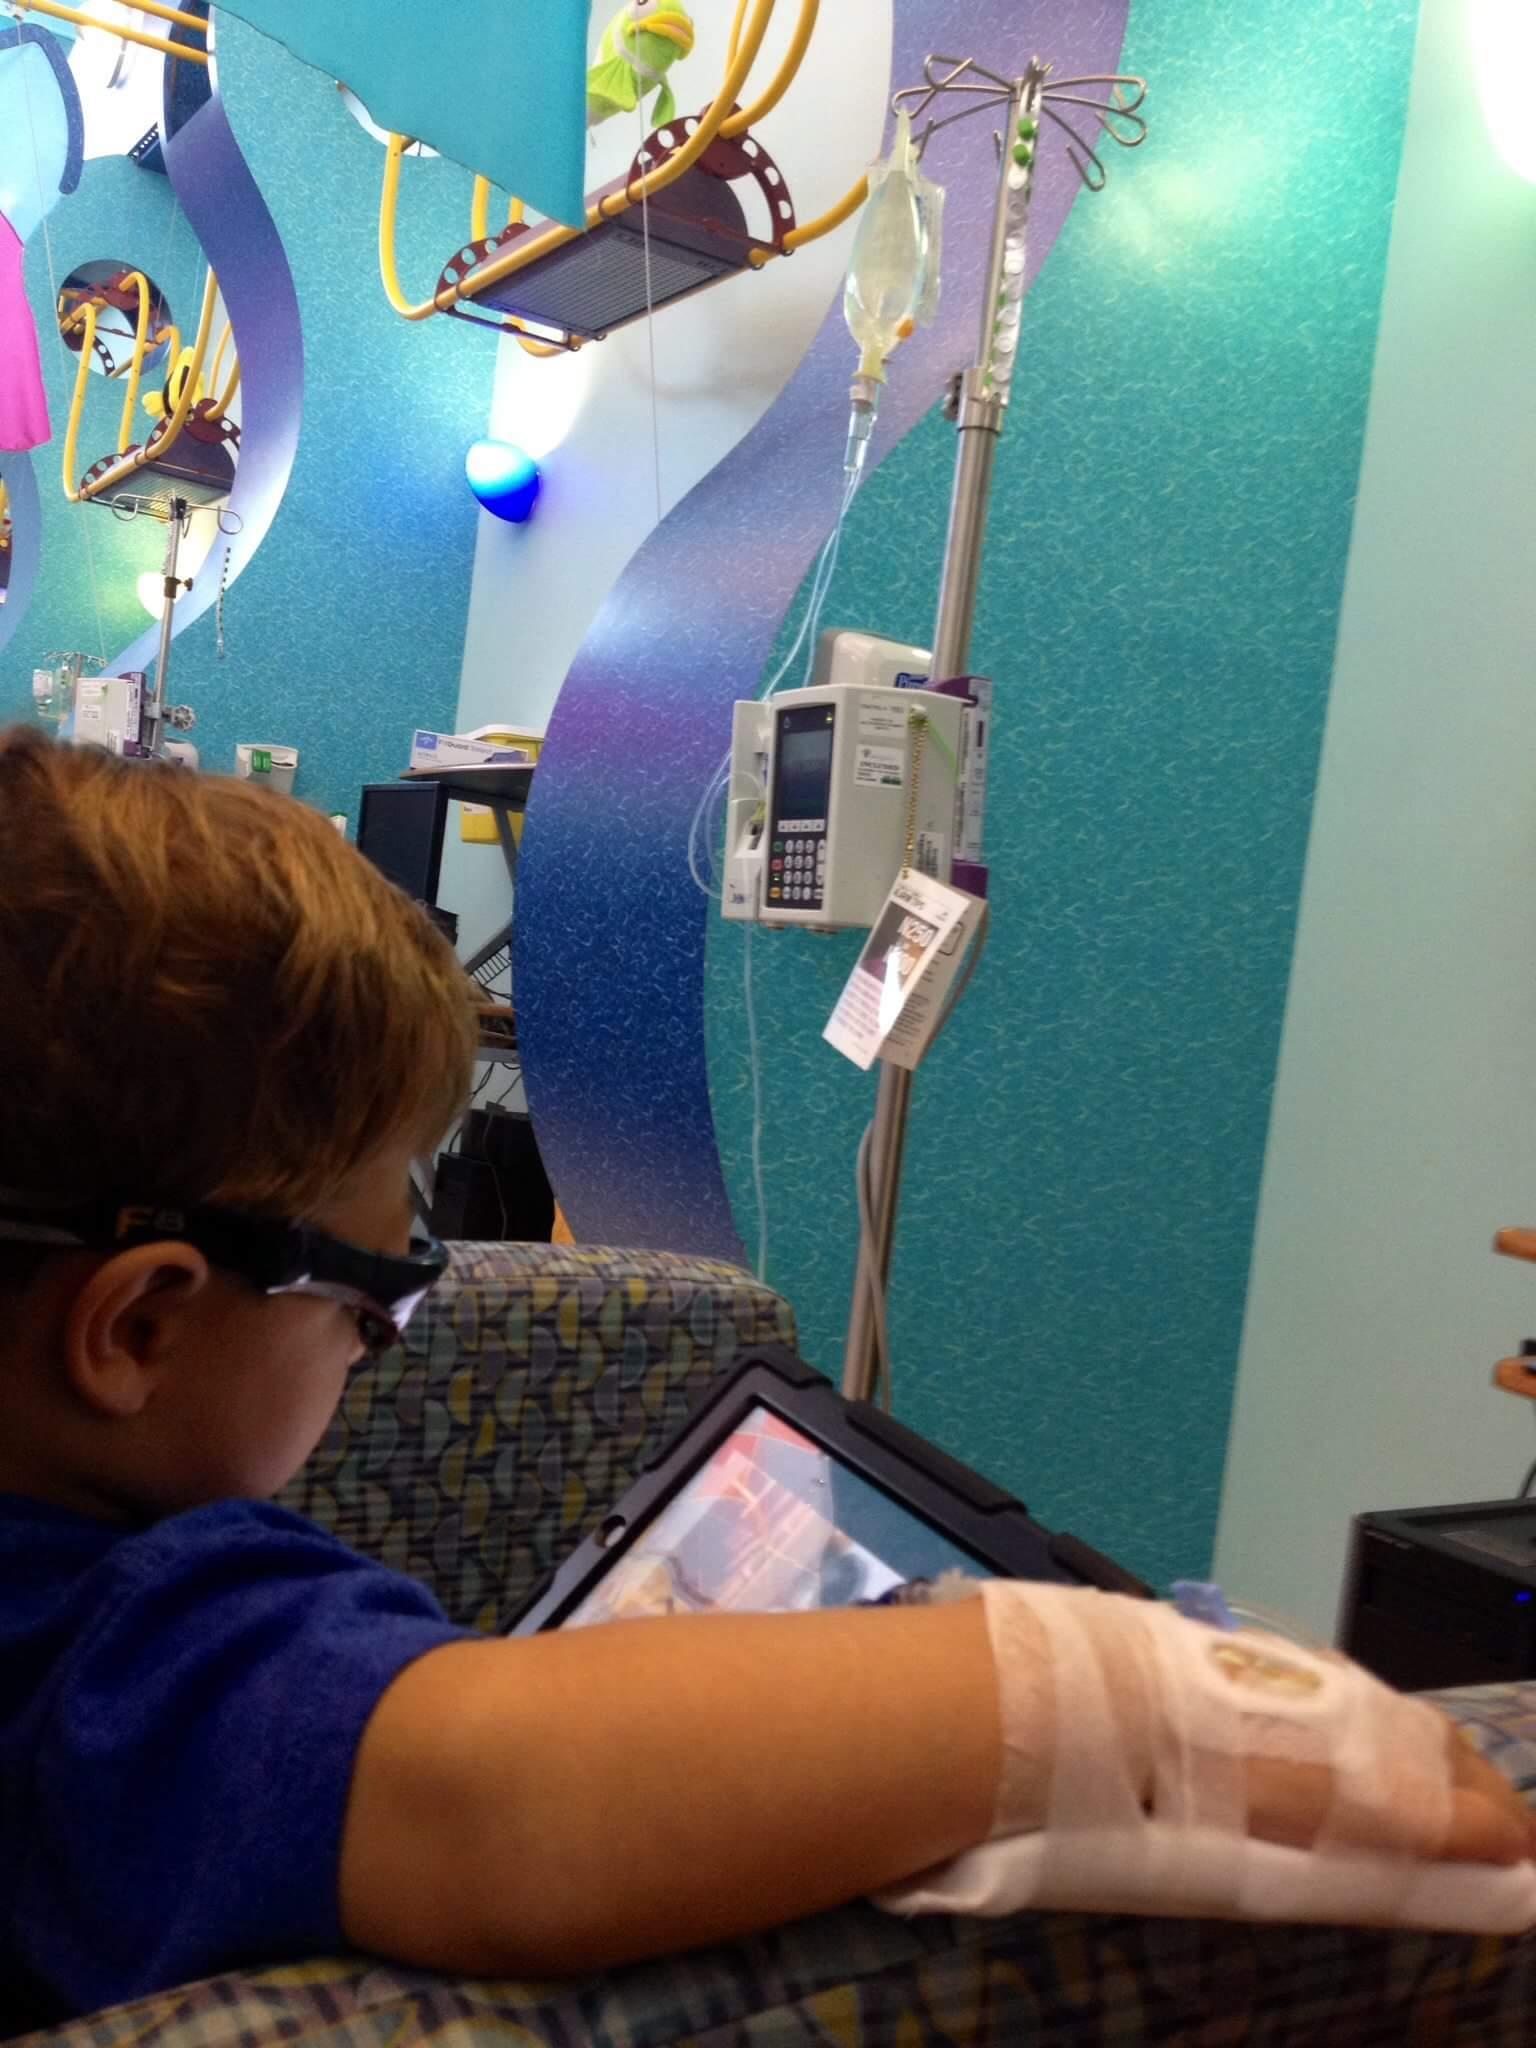 Levi, Pamidonate IV infusion, IV infusion, USA Women & Children Hospital, Mobile, Alabama